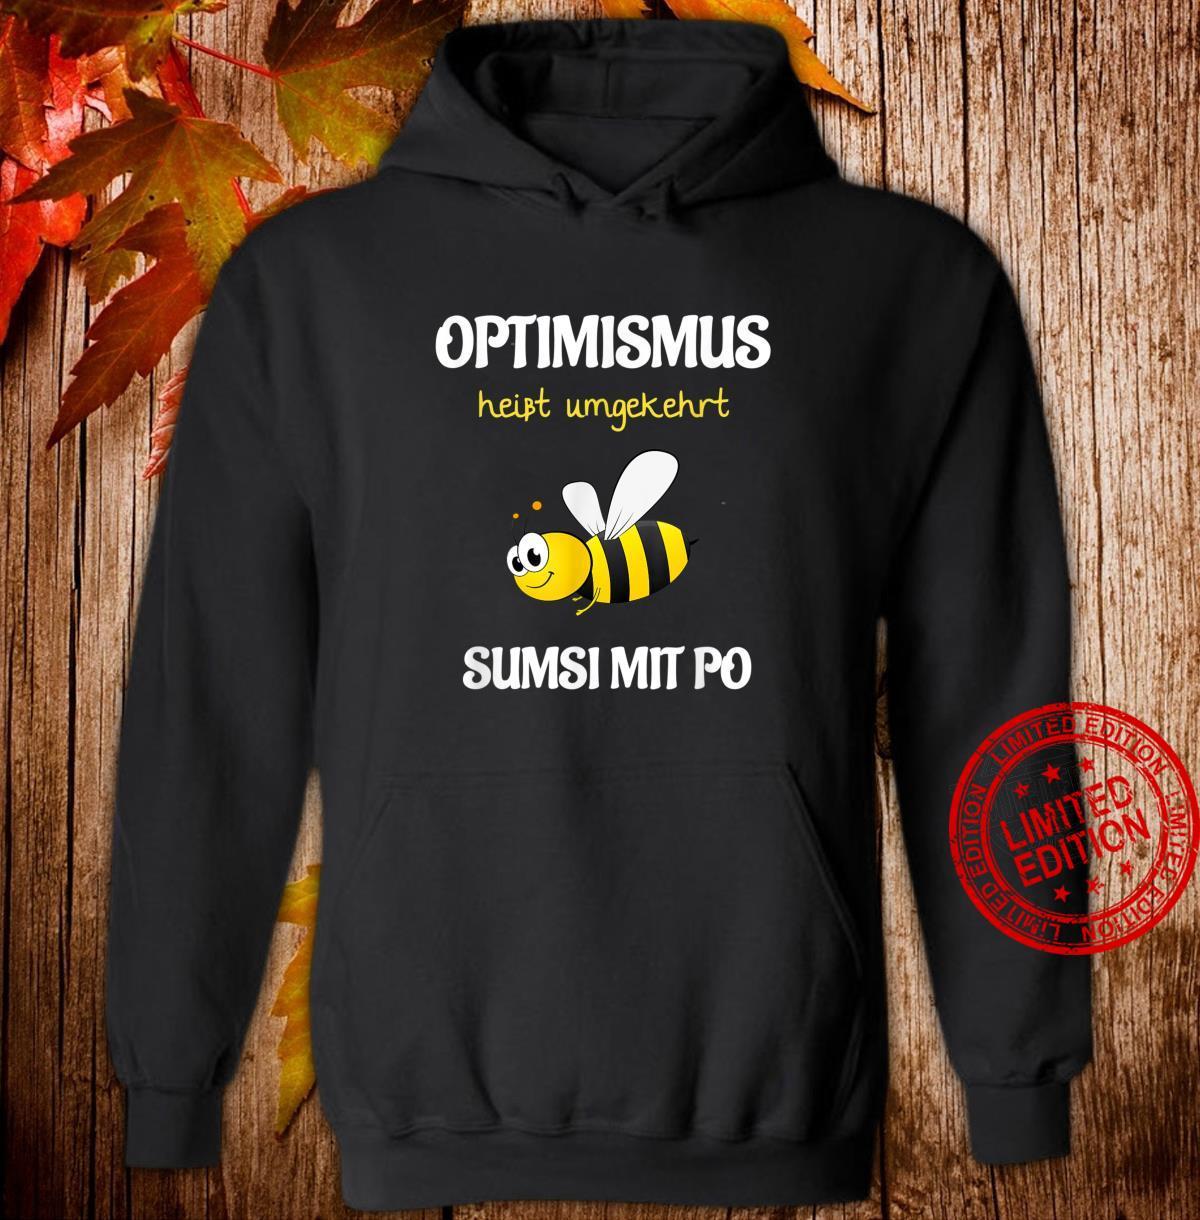 TShirt with Bee Design Optimismus Funny and Sumsi with Bum Beekeeper [German Language] Shirt hoodie